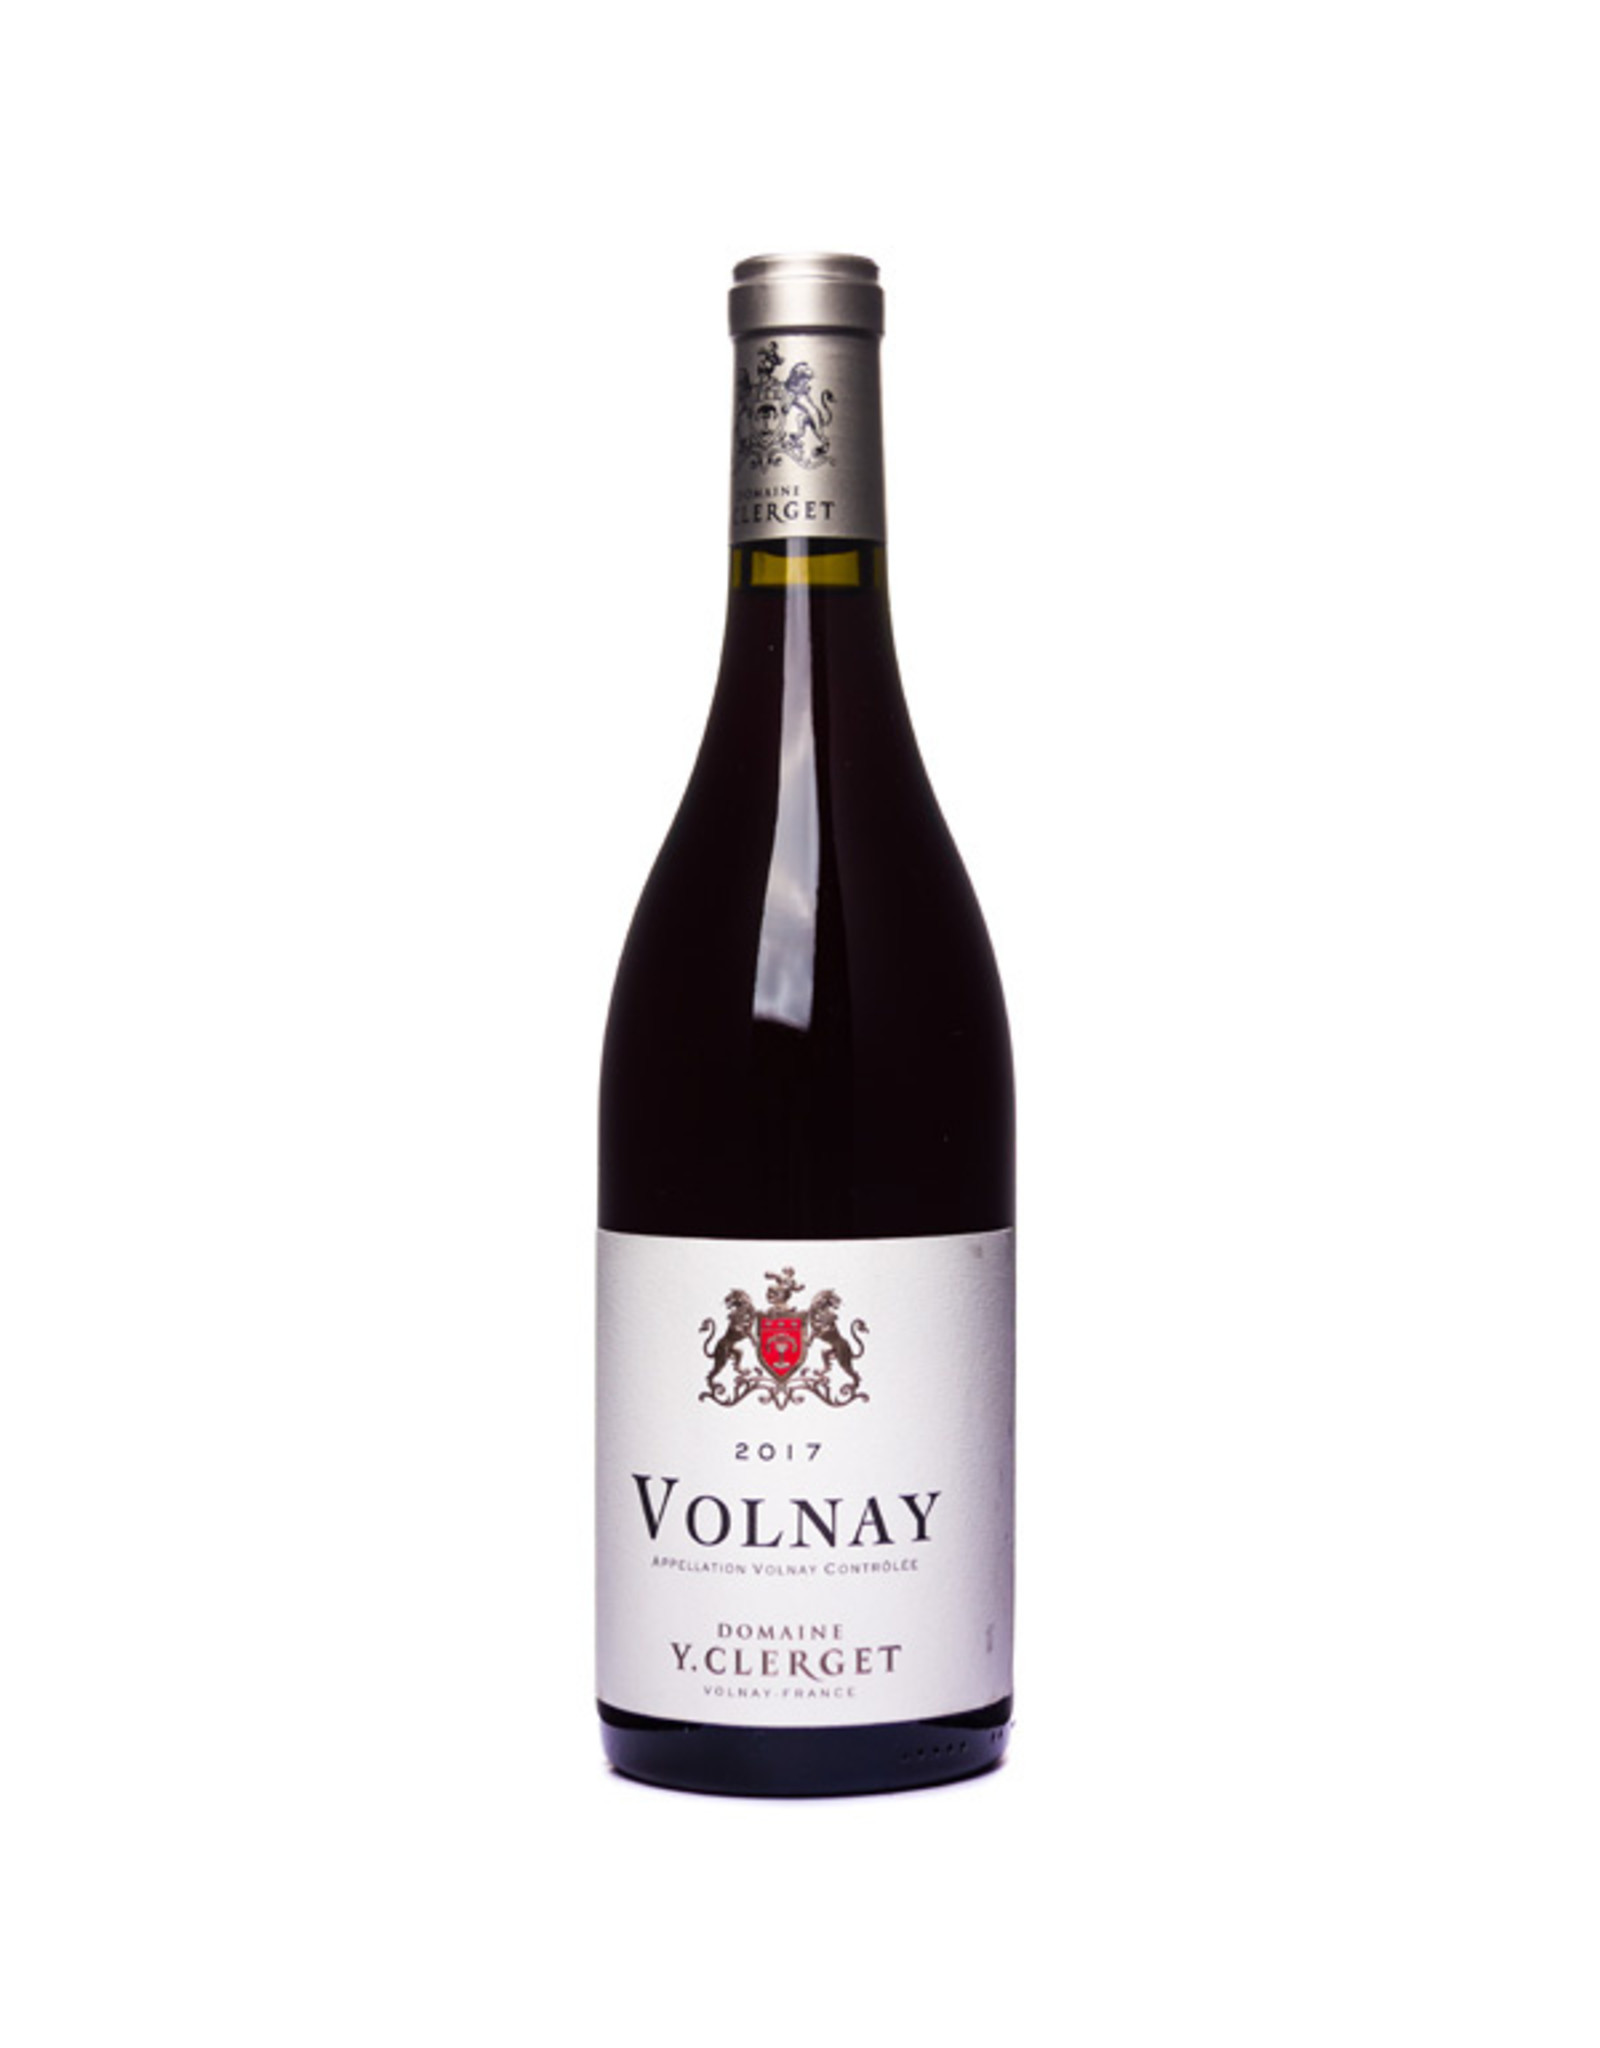 Domaine Y. Clerget, Volnay Yves Clerget Volnay 2017